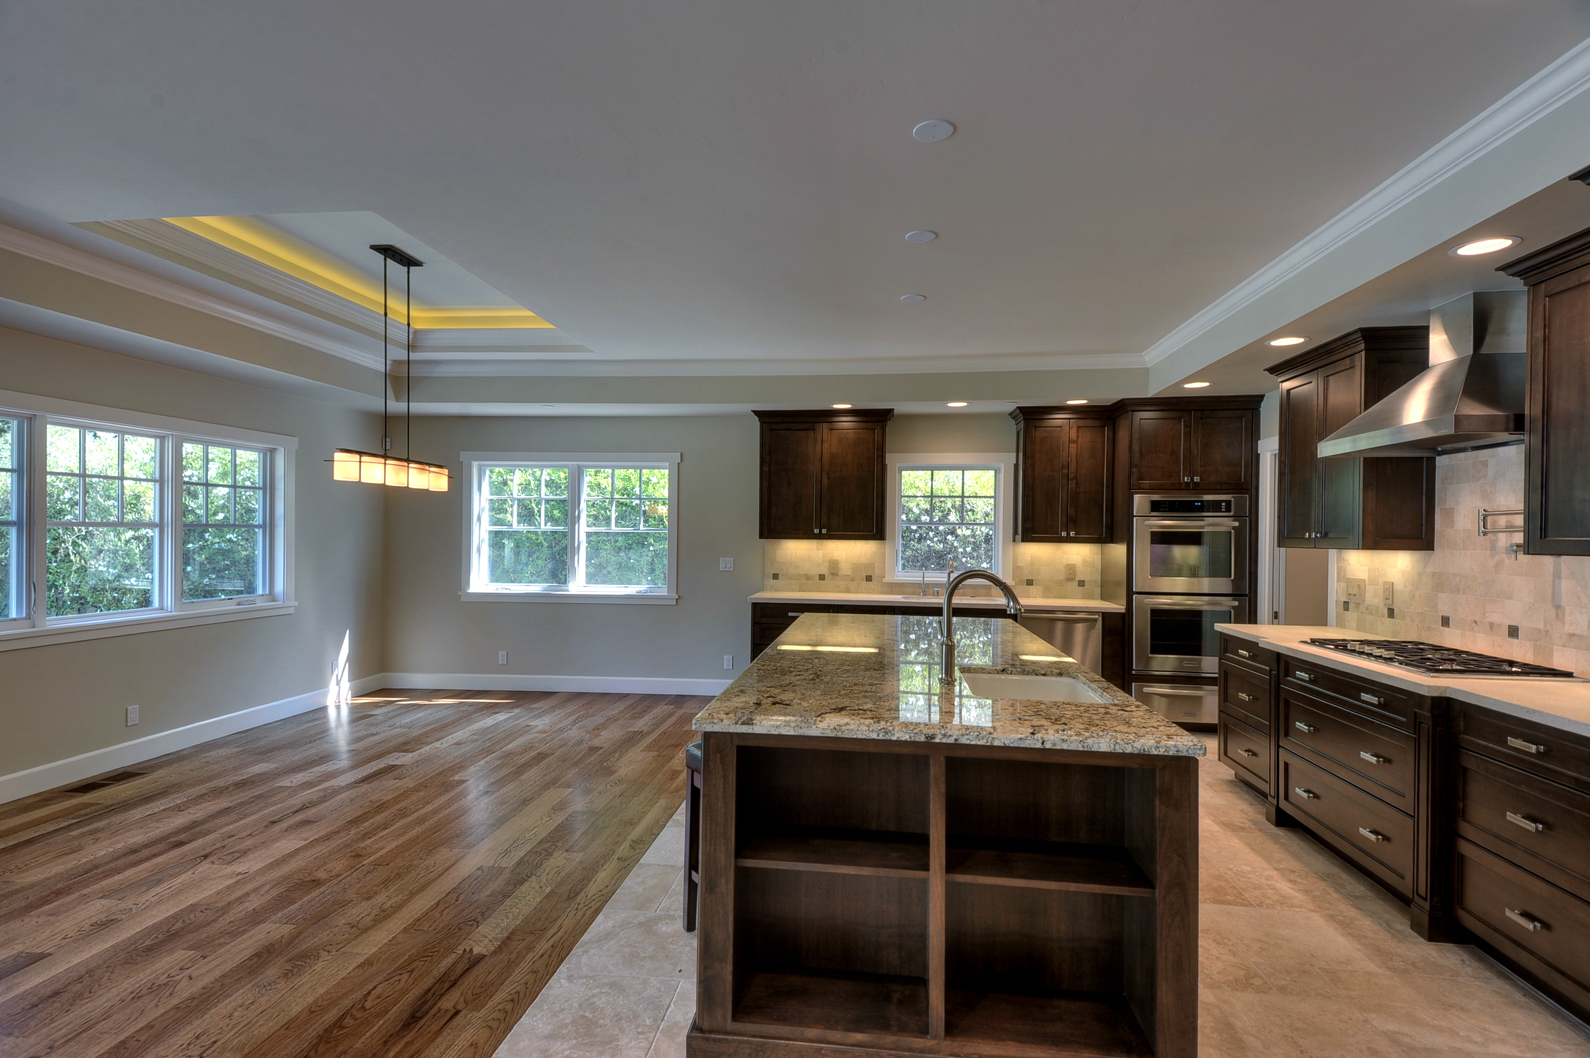 Kitchen Area Resized